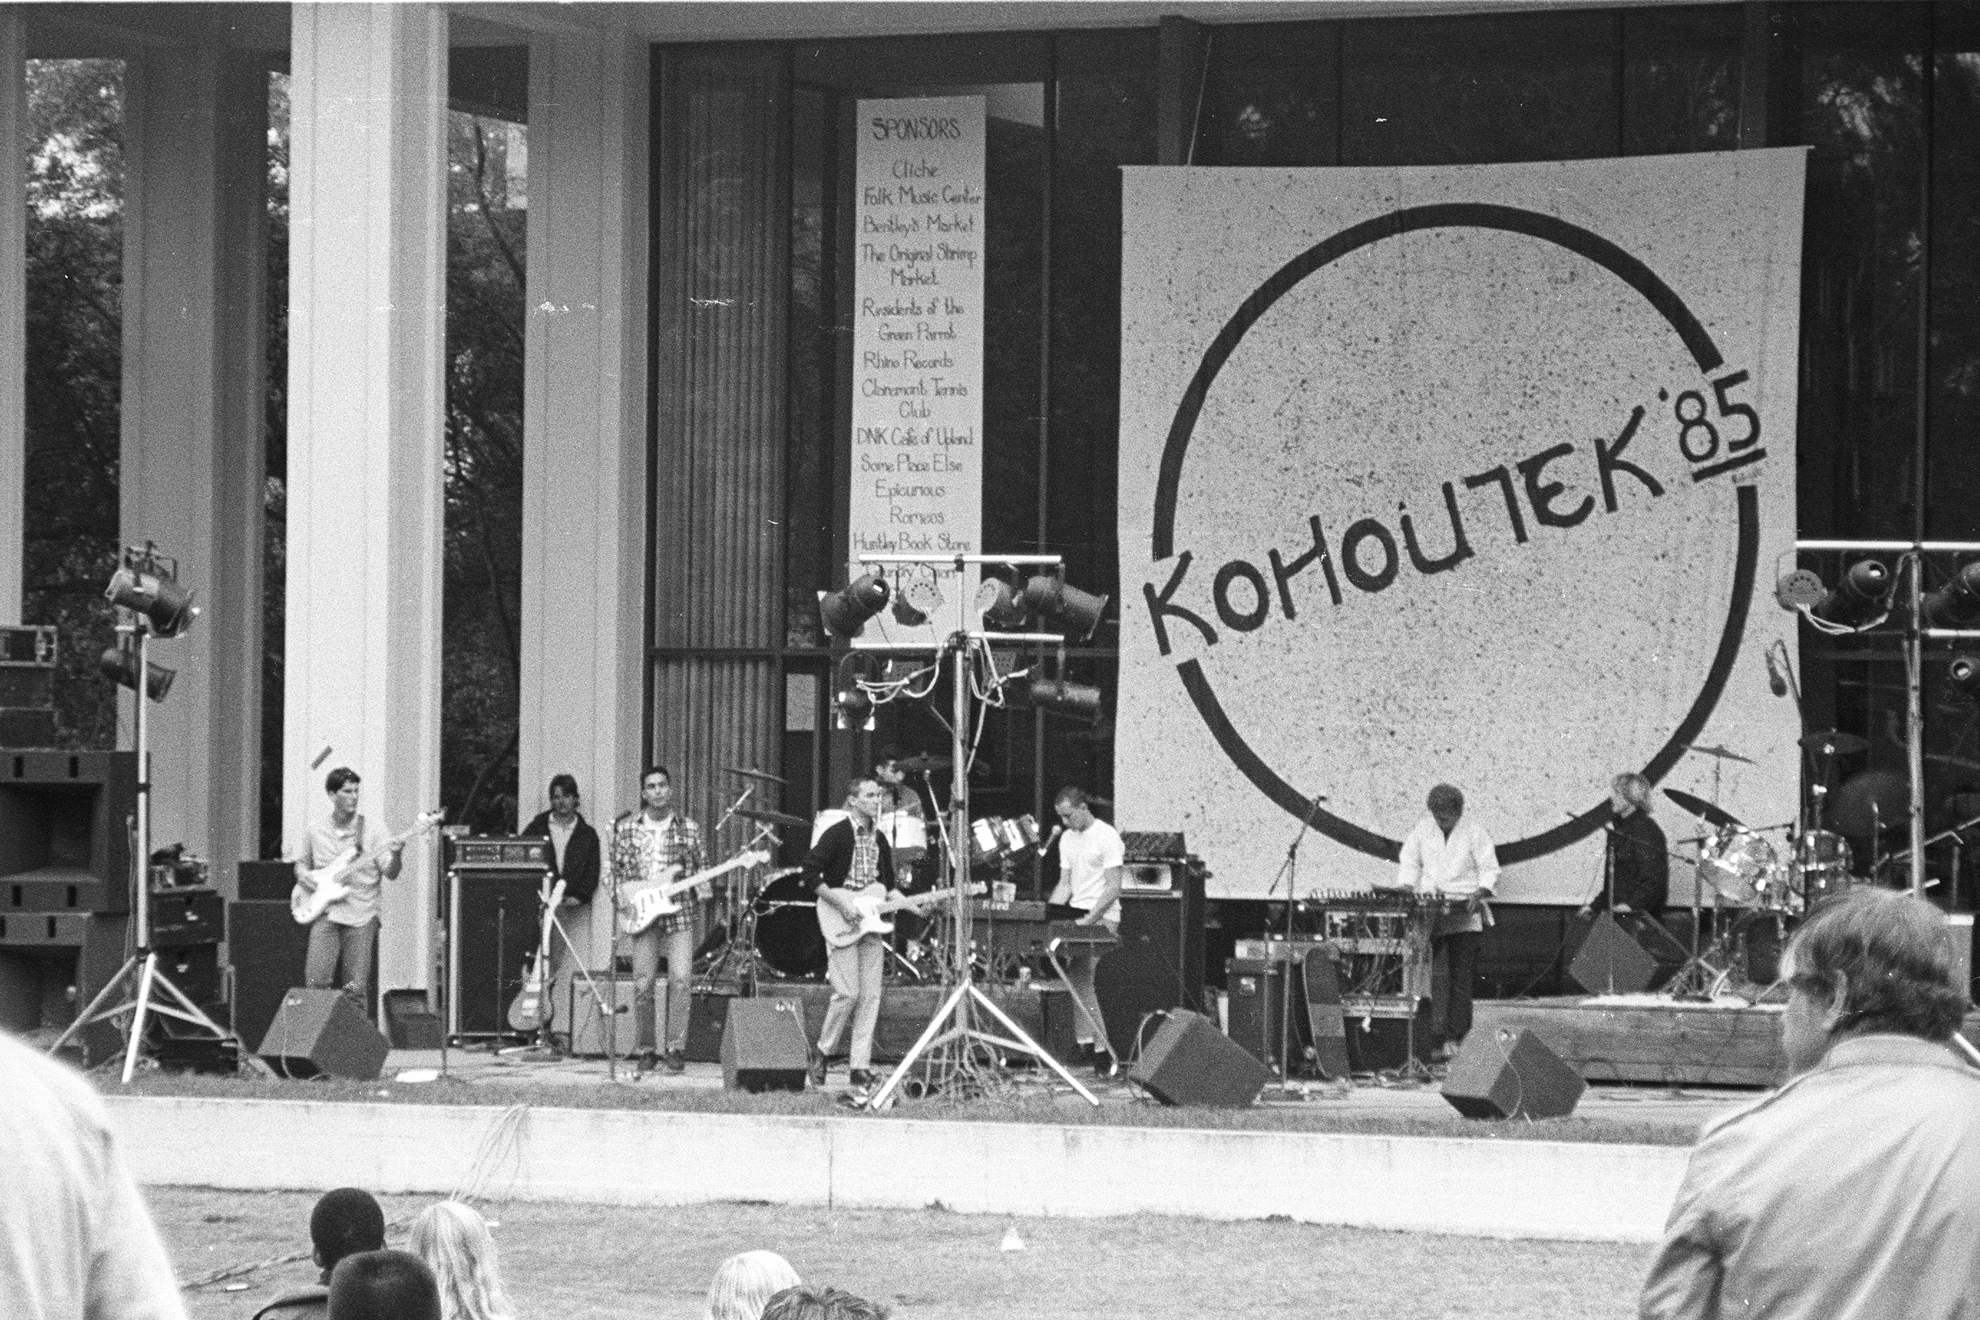 1985 - Kohoutek on the McConnell Apron